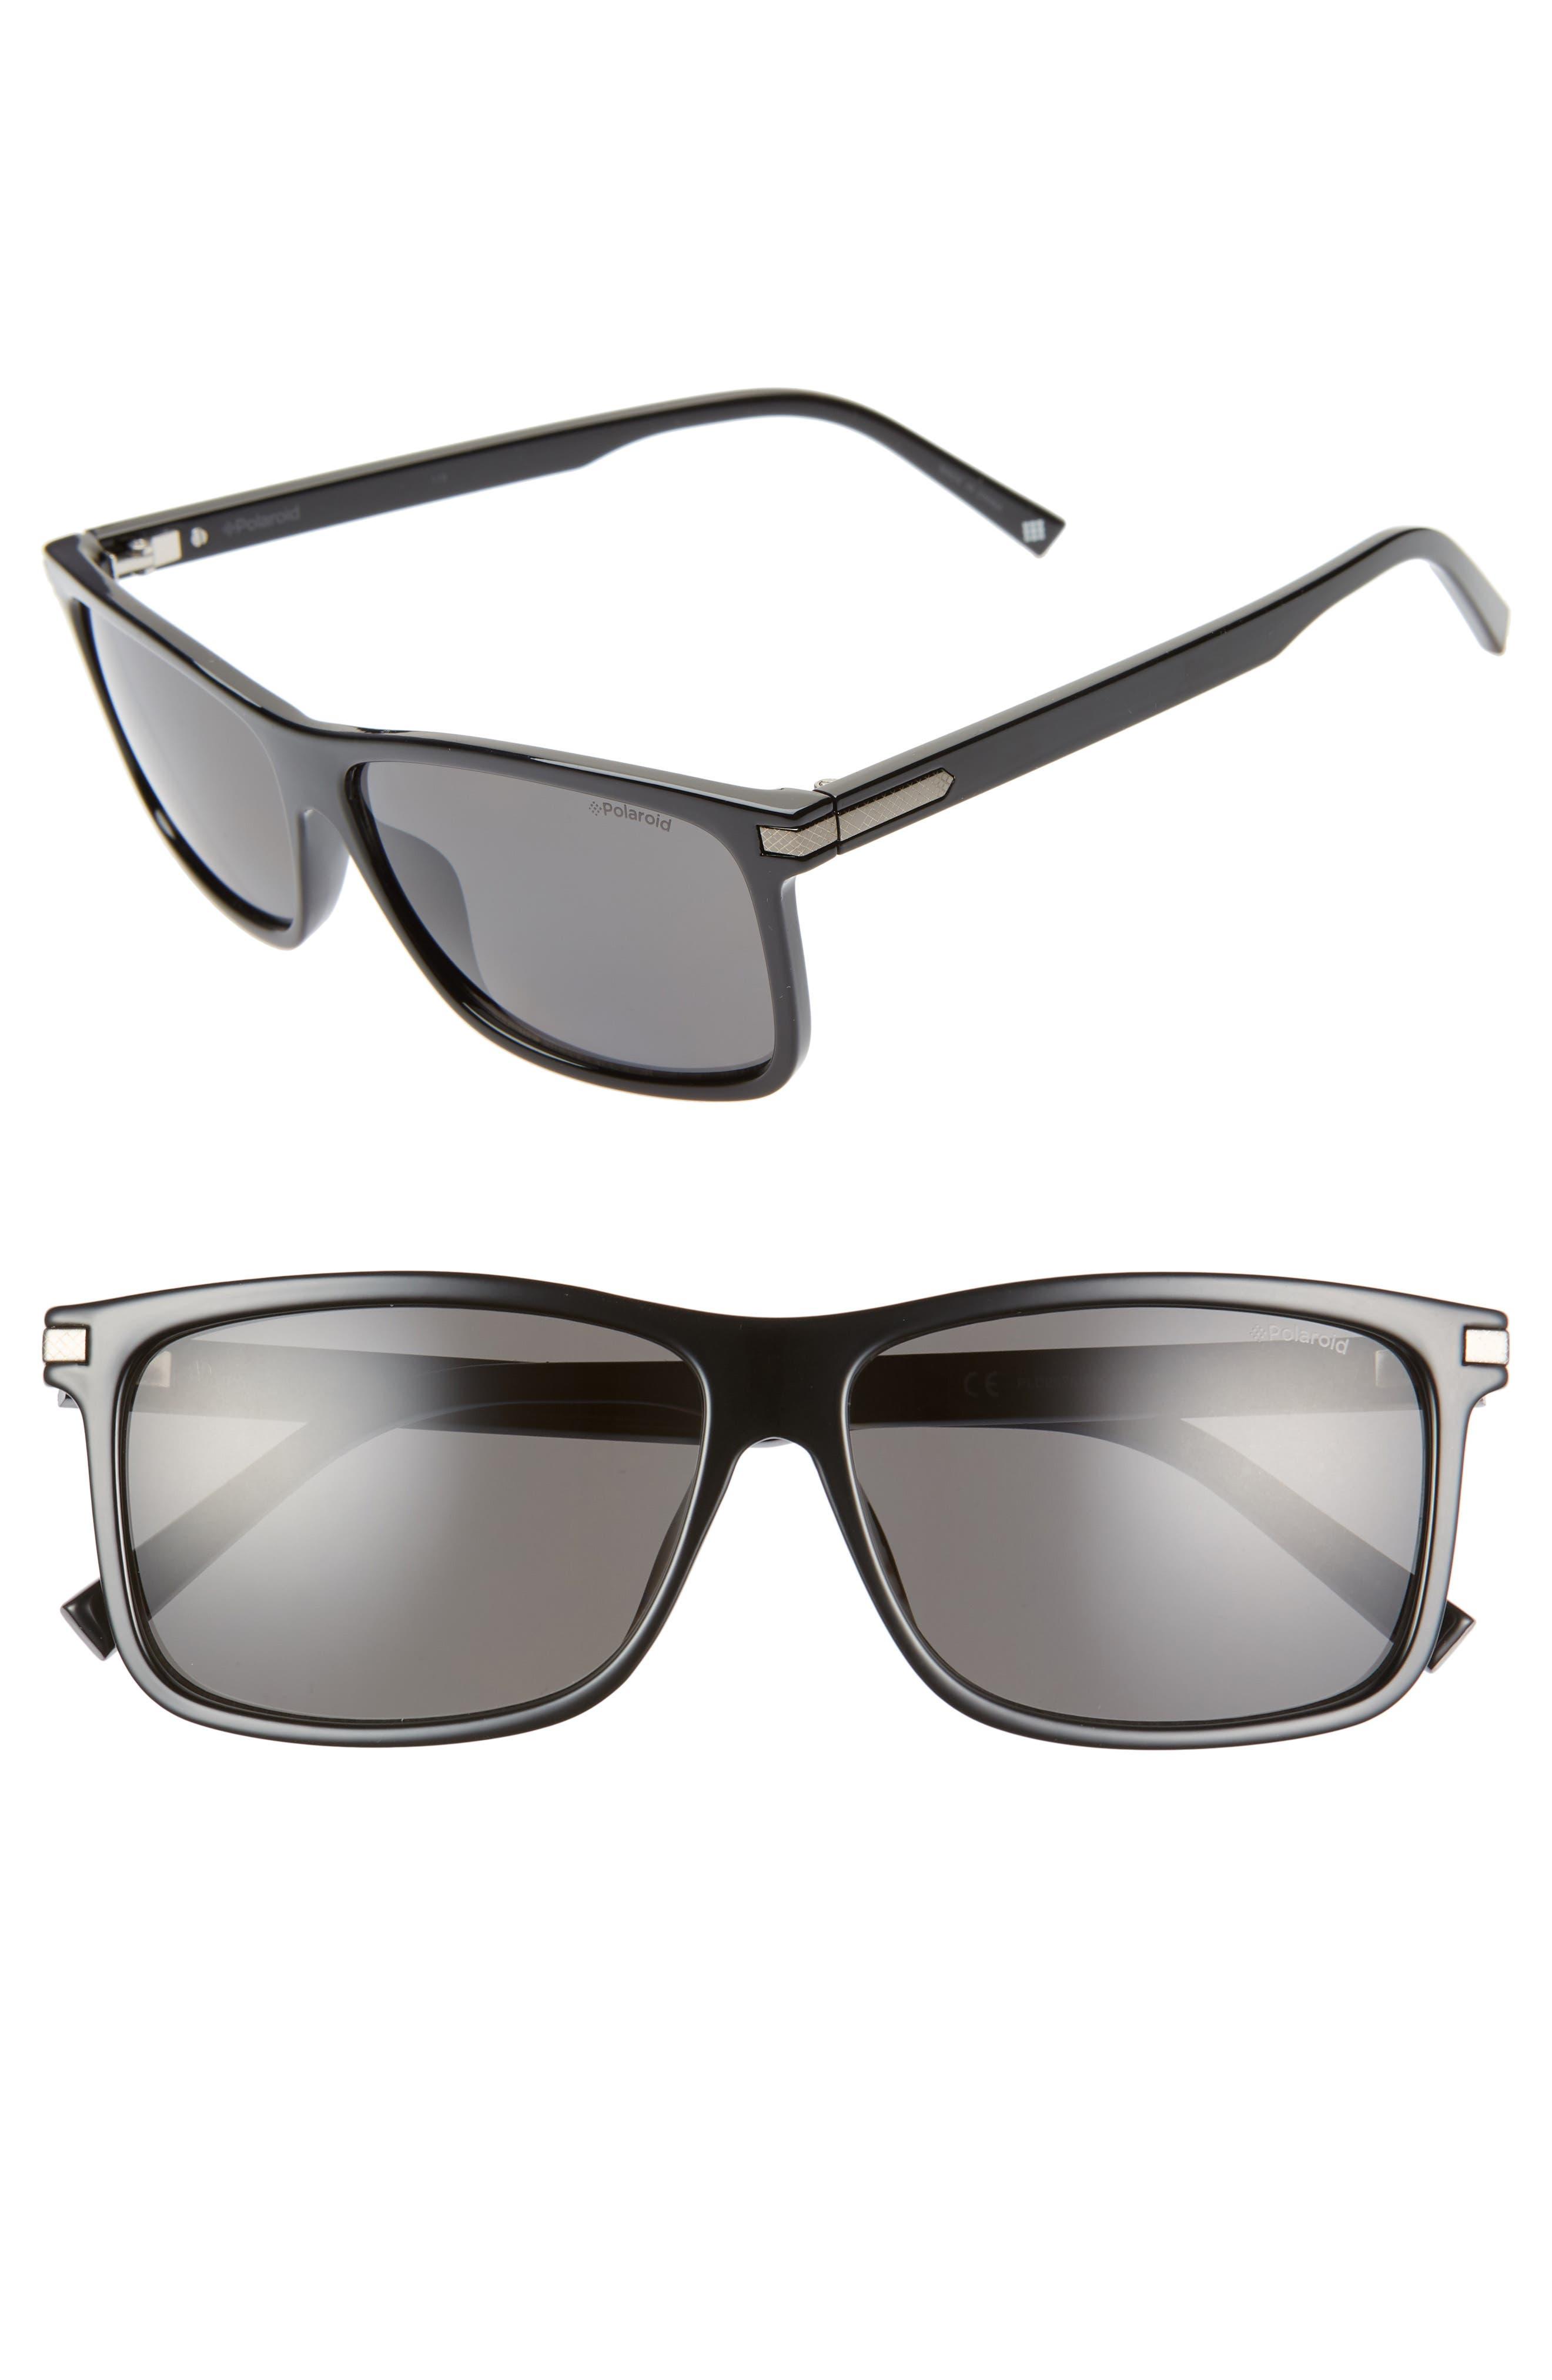 Polaroid 5m Polarized Rectangle Sunglasses - Black